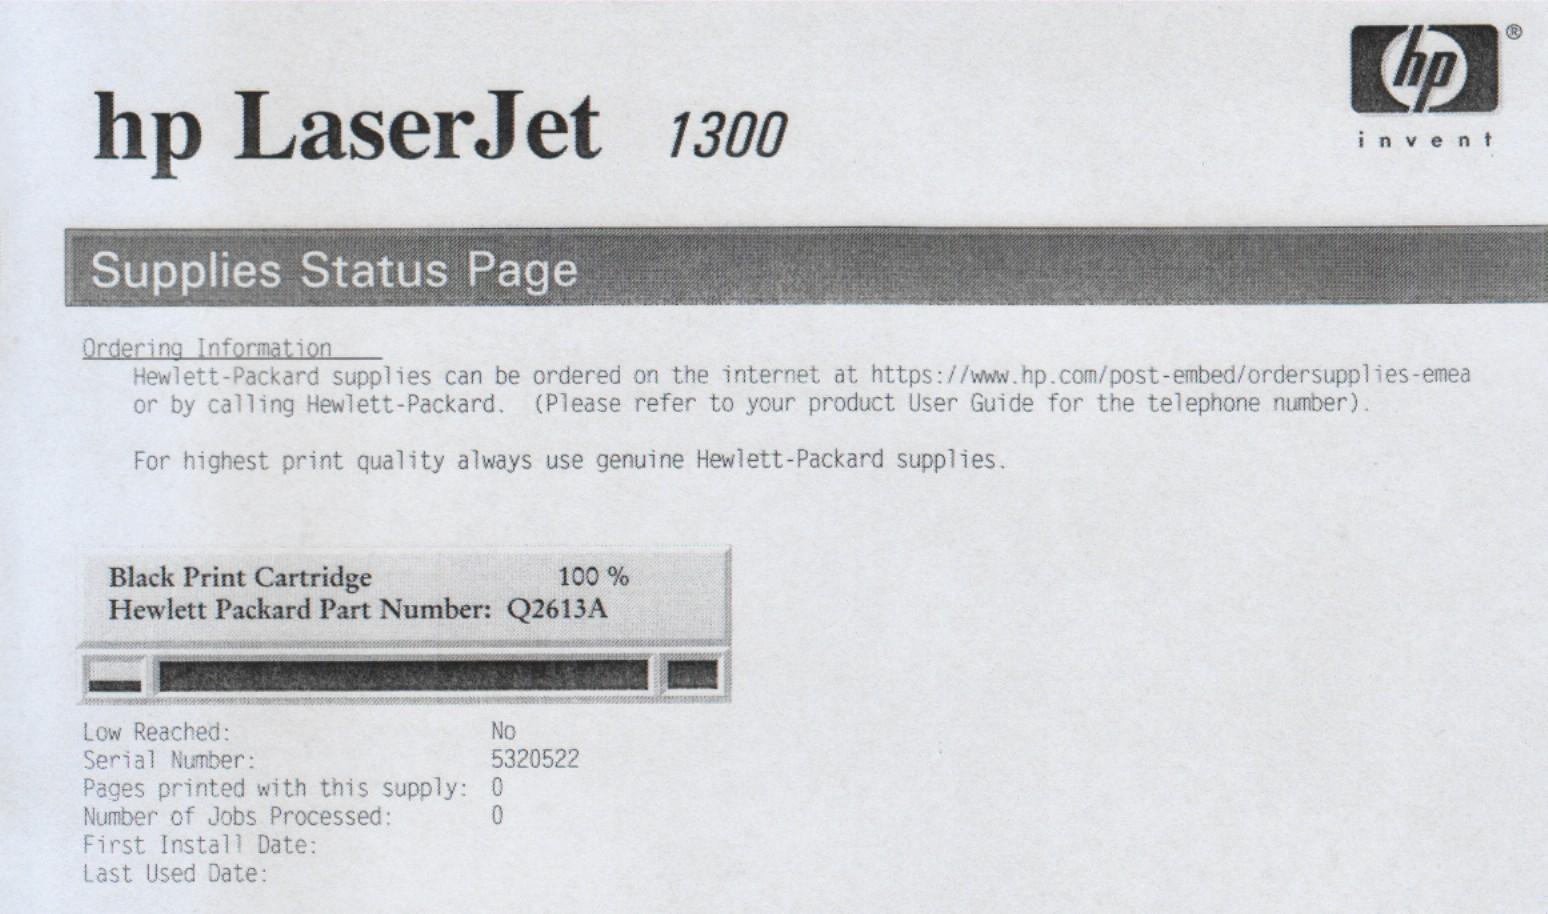 HP laser Jet 1300 s�abe nasycenie czerni